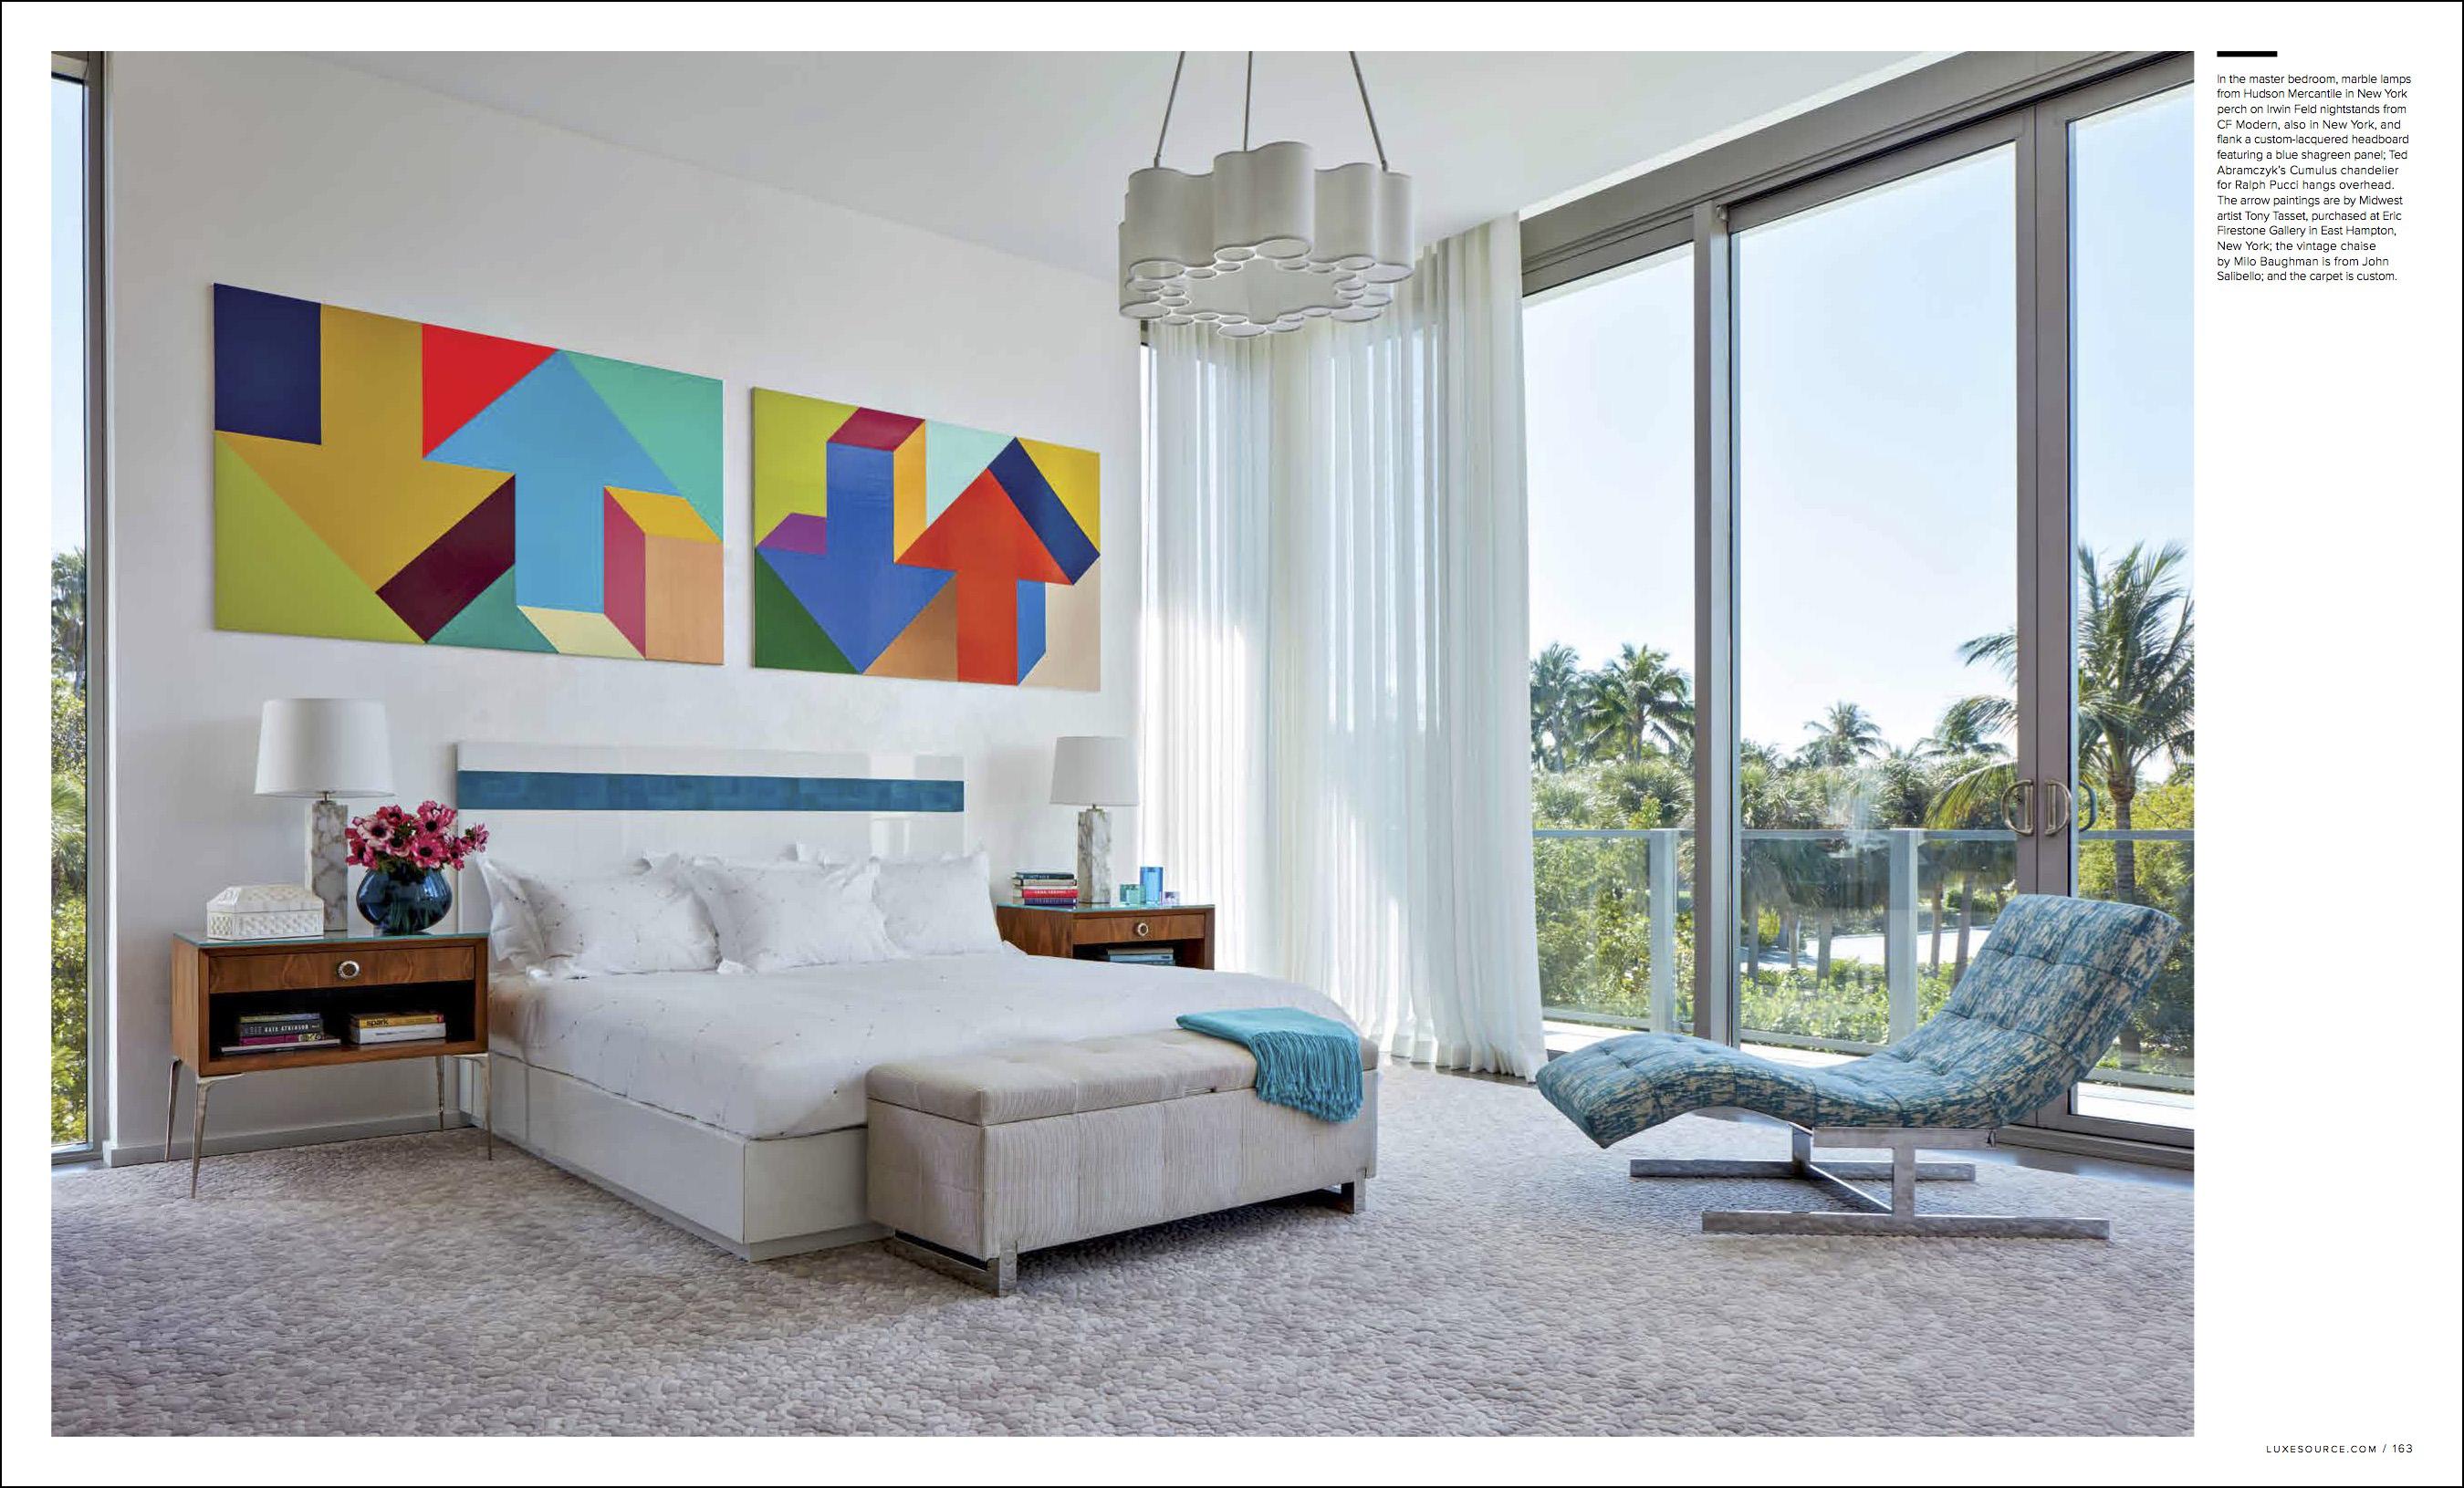 Magazine Cover Photography Miami Interior Design 14 May 2017